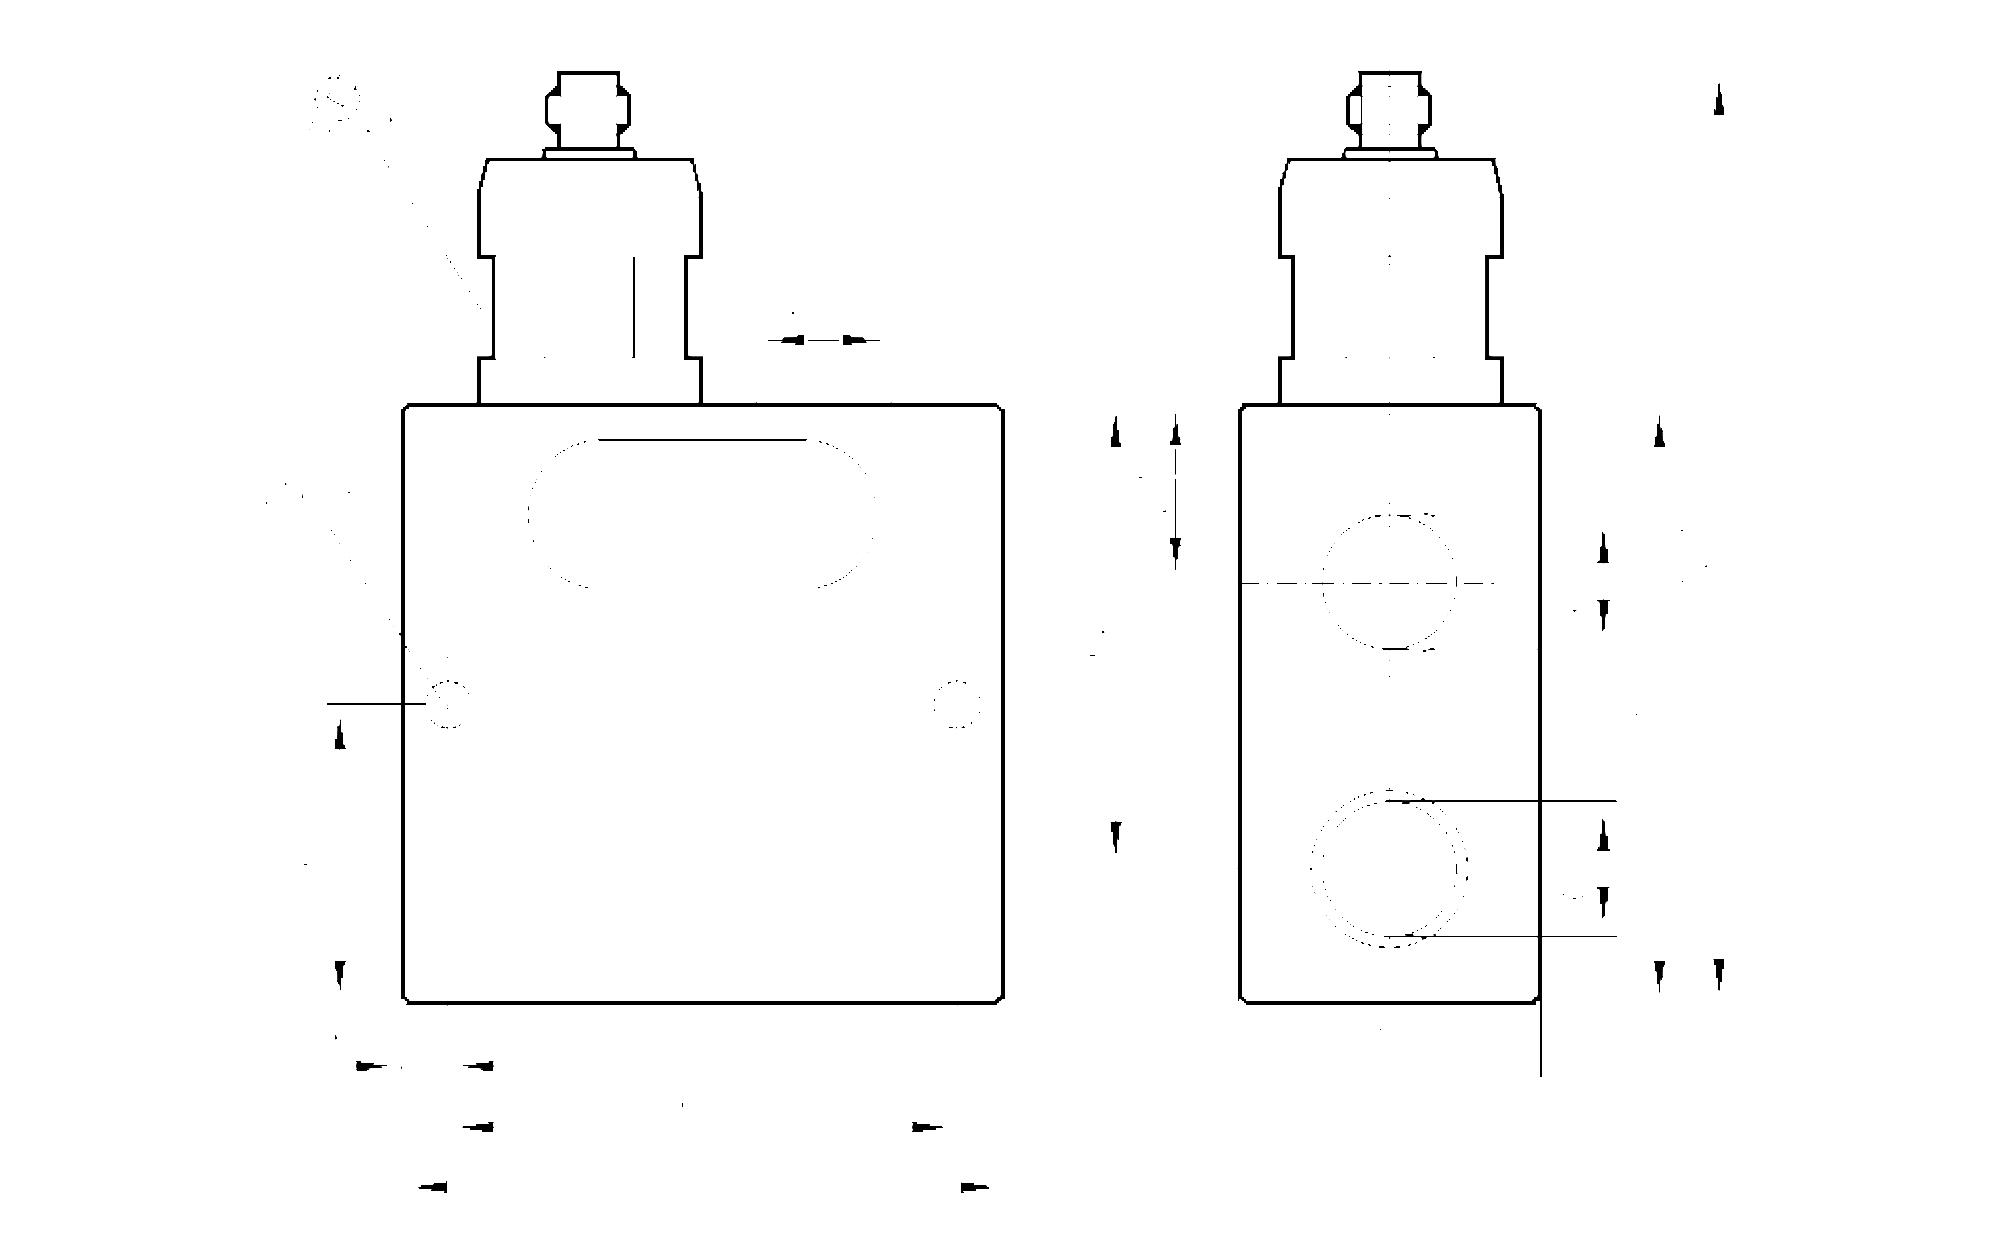 sbu625